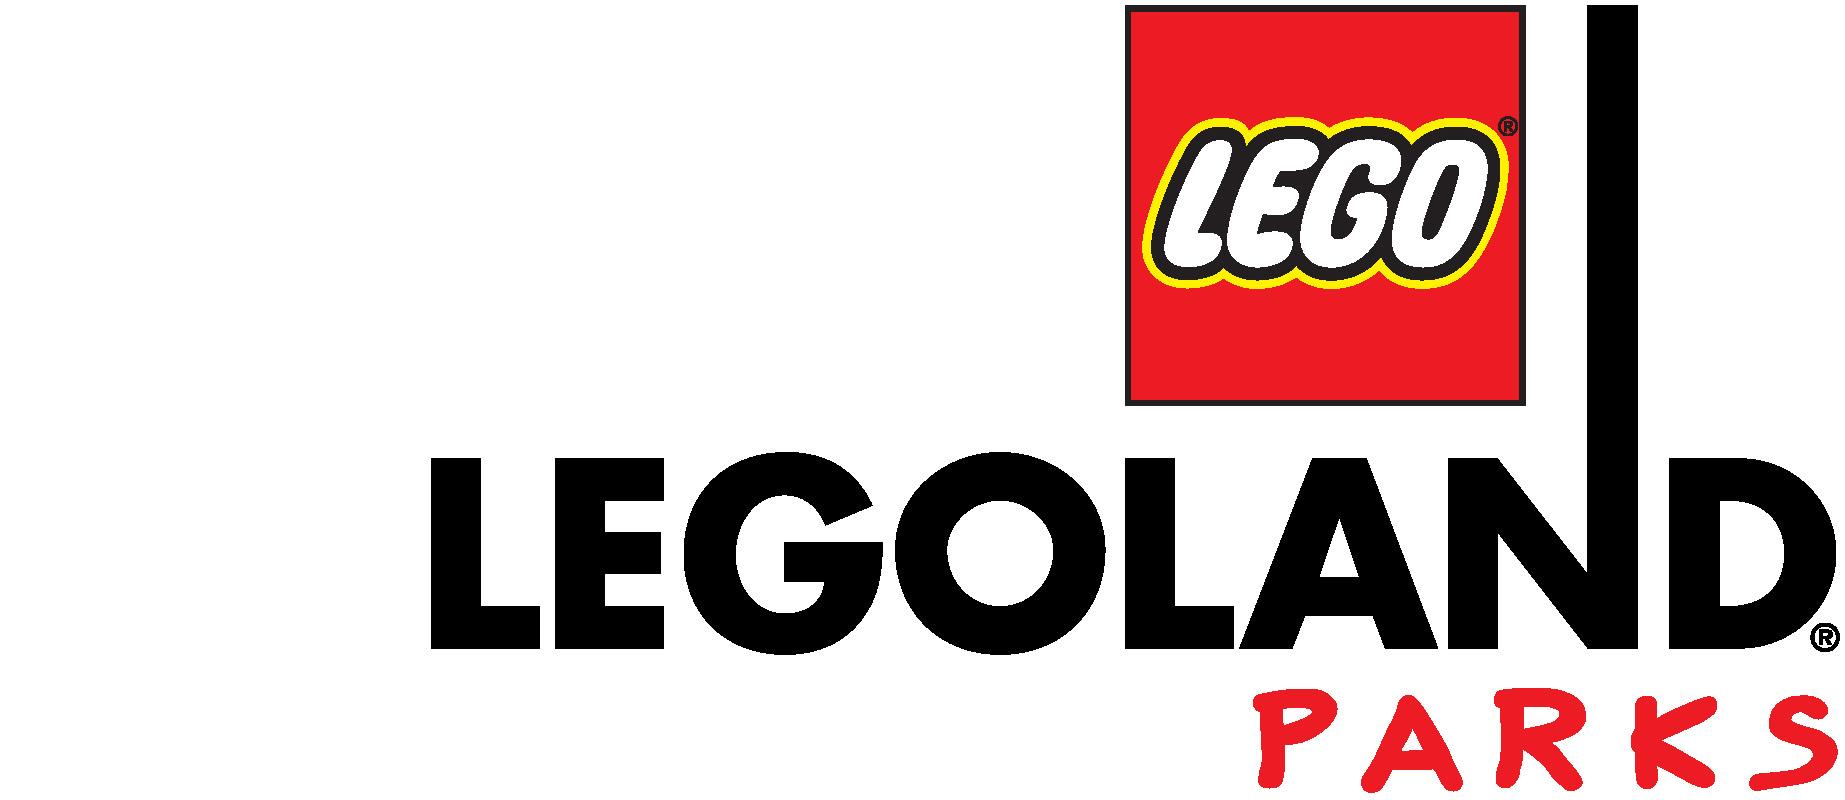 LEGOLAND_PARKS_LOGO.jpg